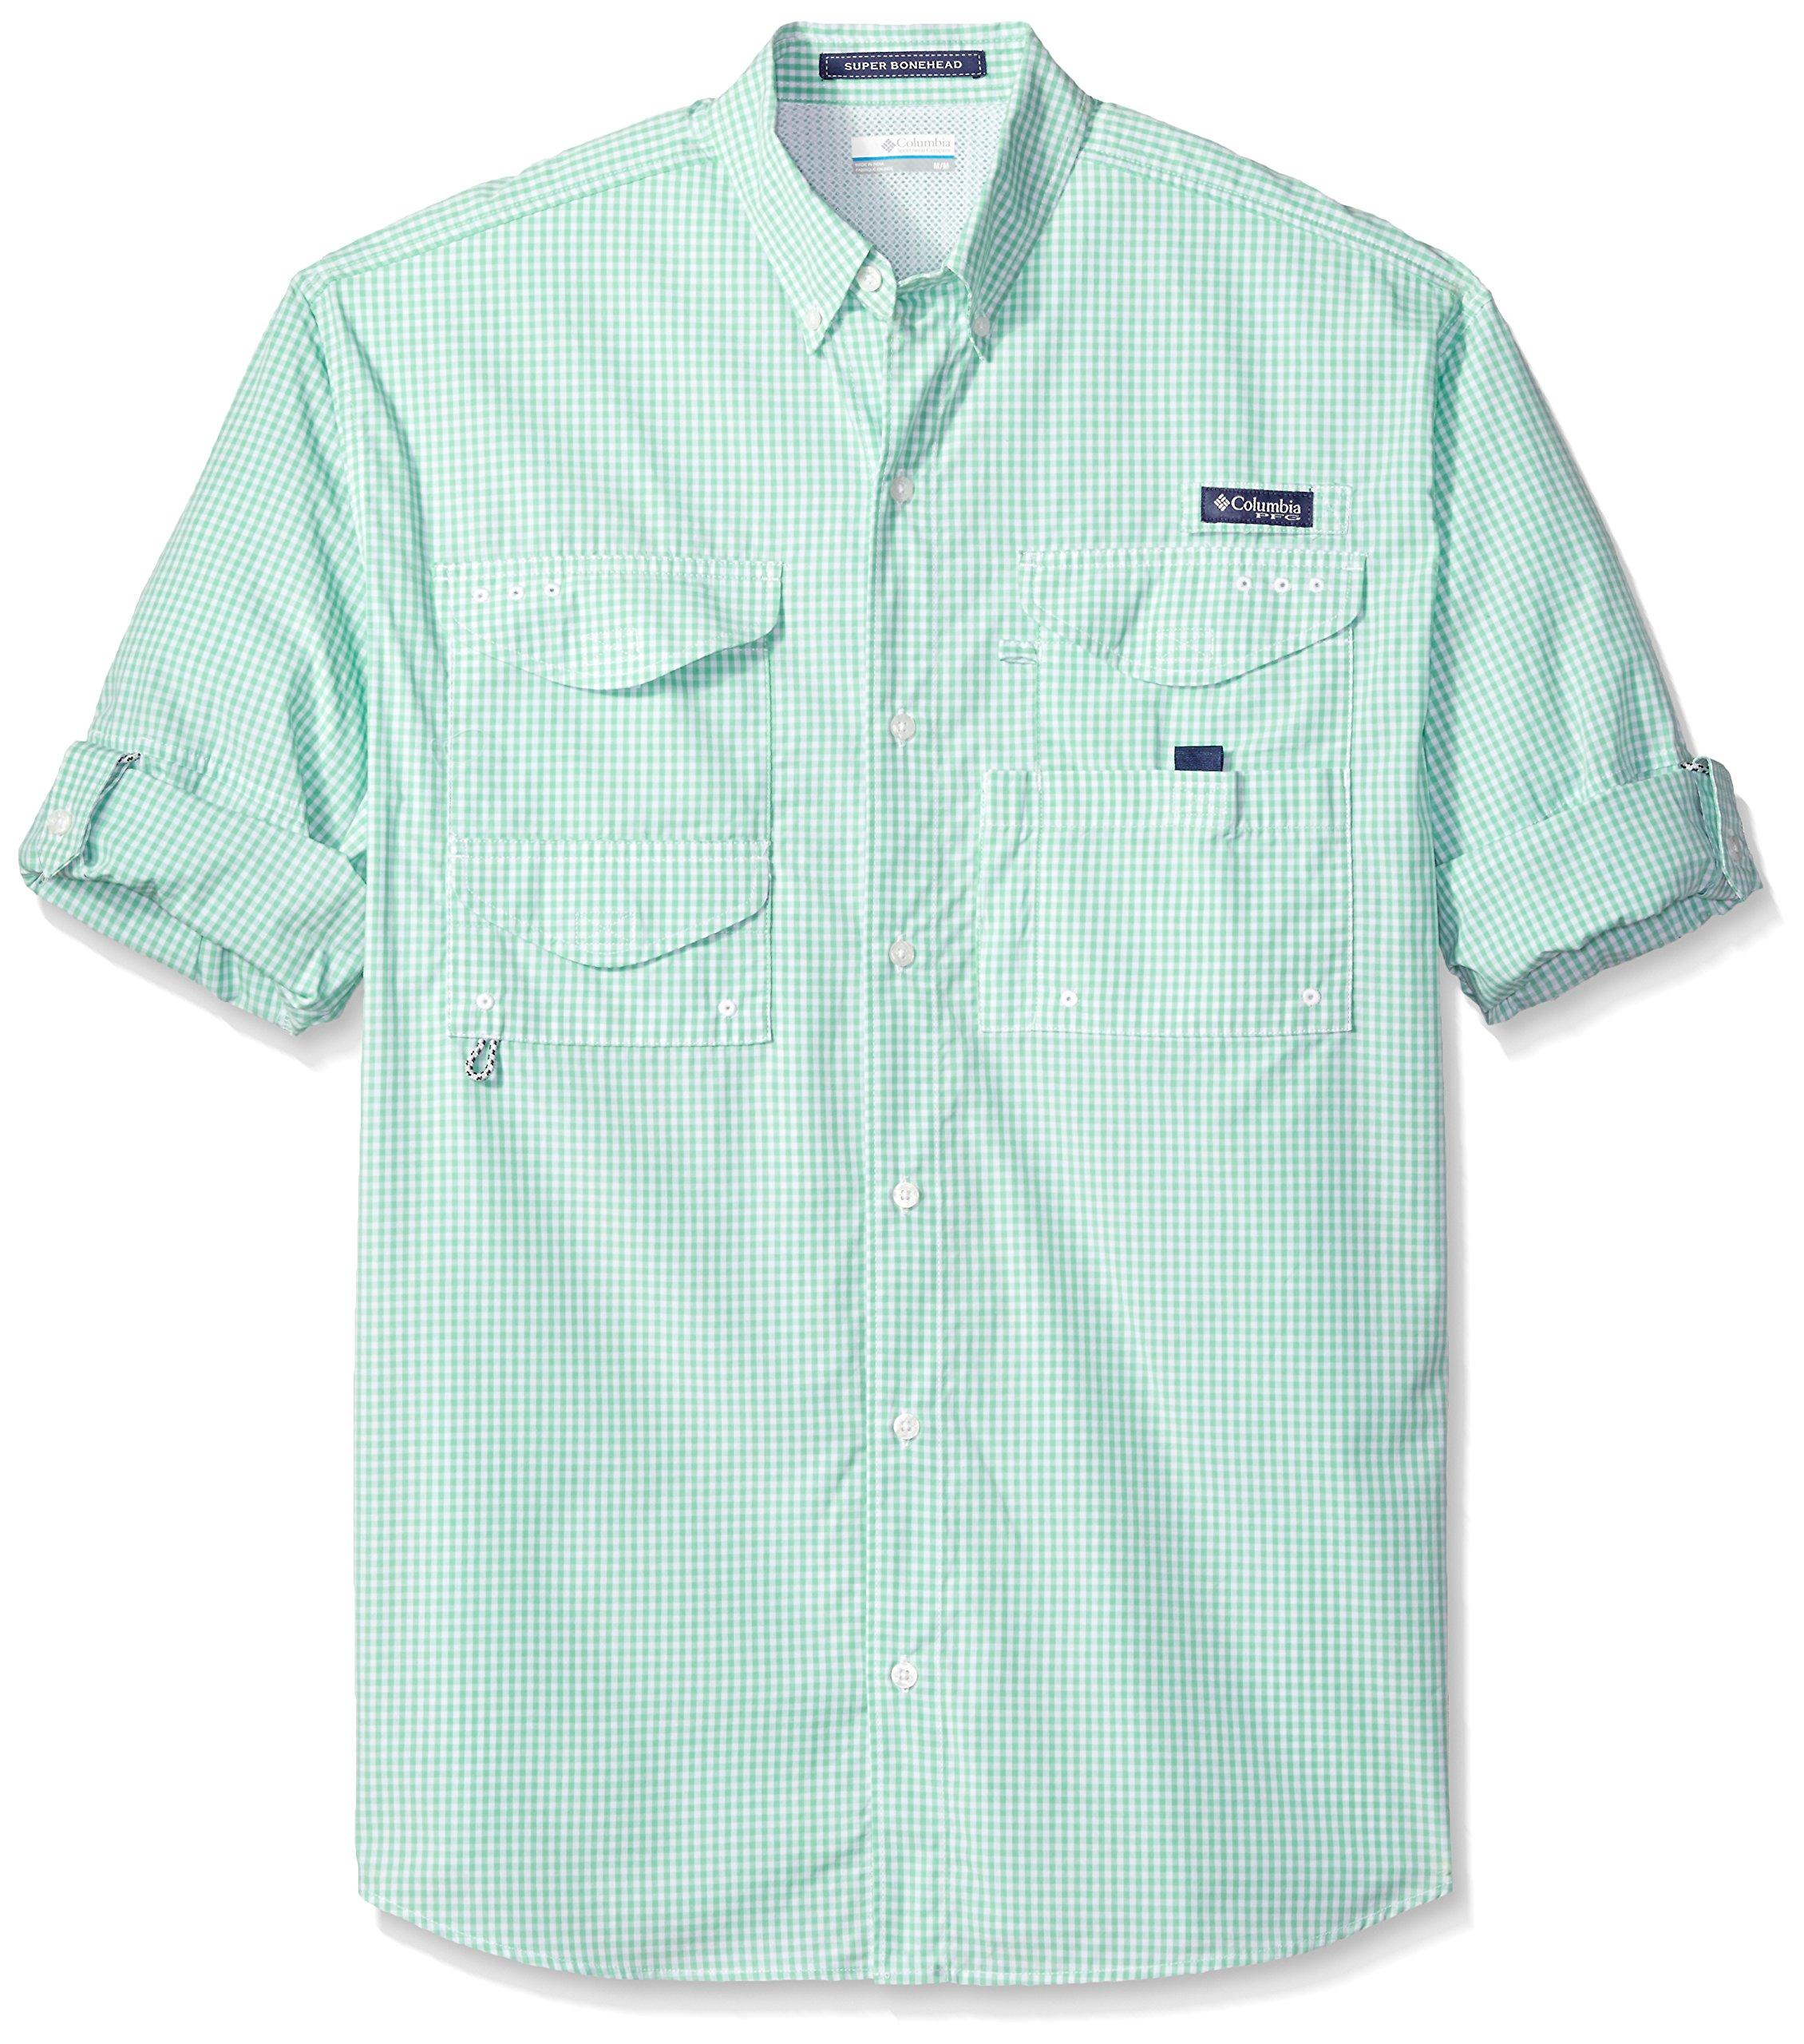 Columbia Men's Super Bonehead Classic Long Sleeve Shirt, Kelp Gingham, Medium by Columbia